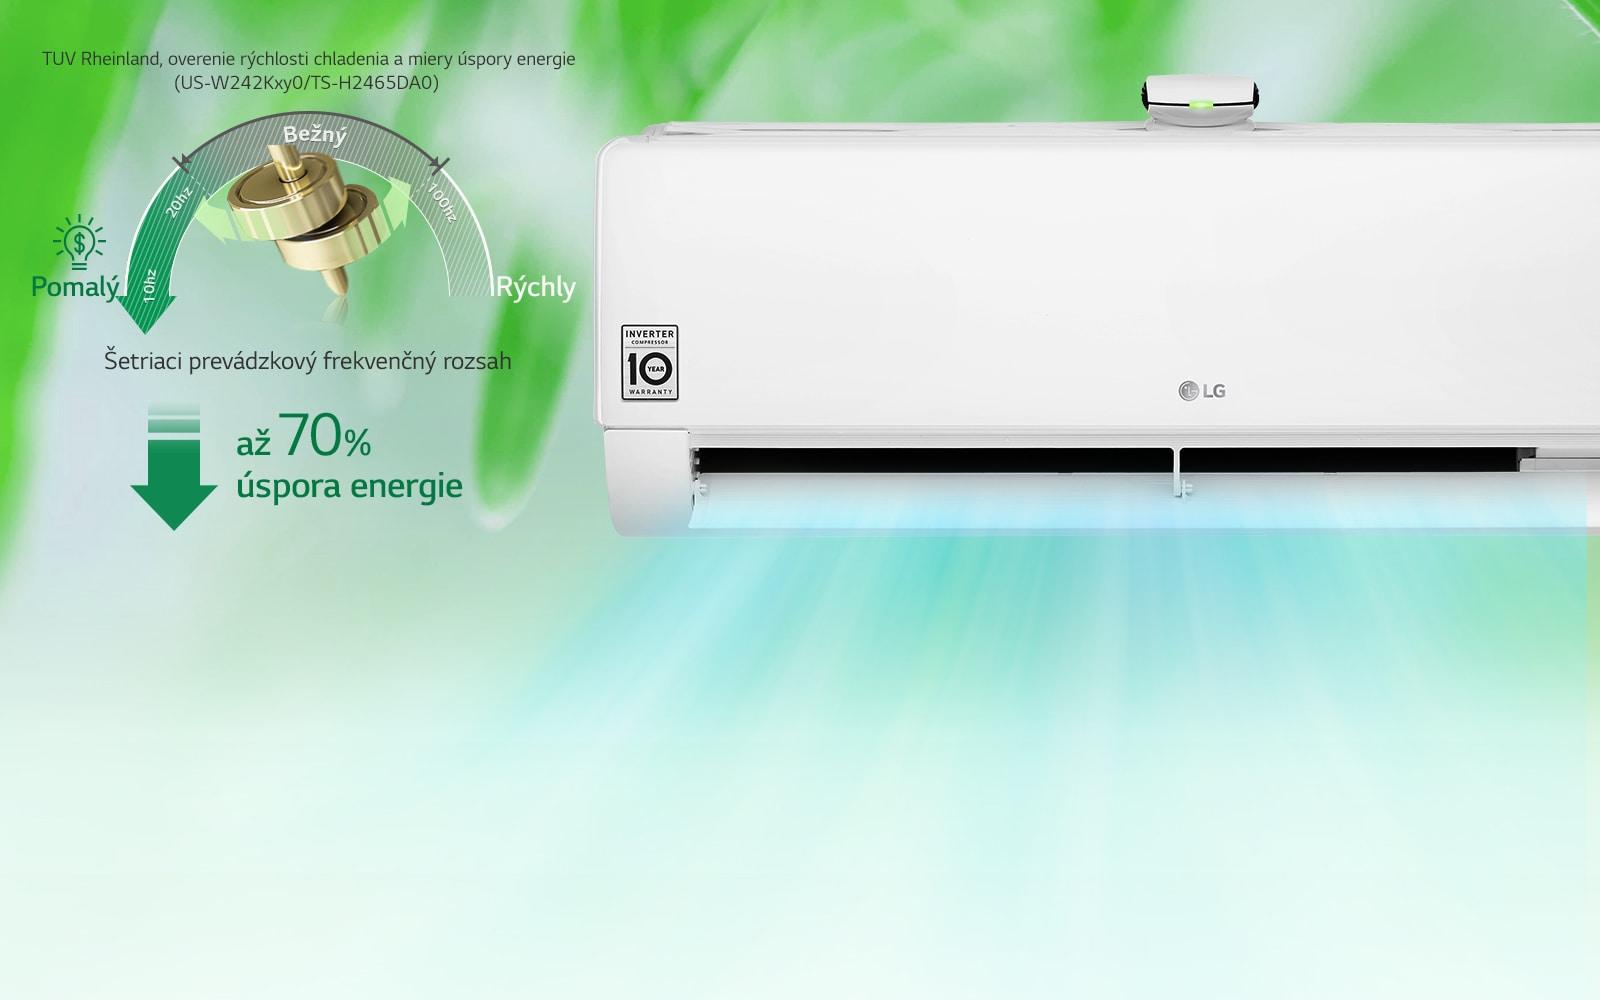 Energieeinsparung3